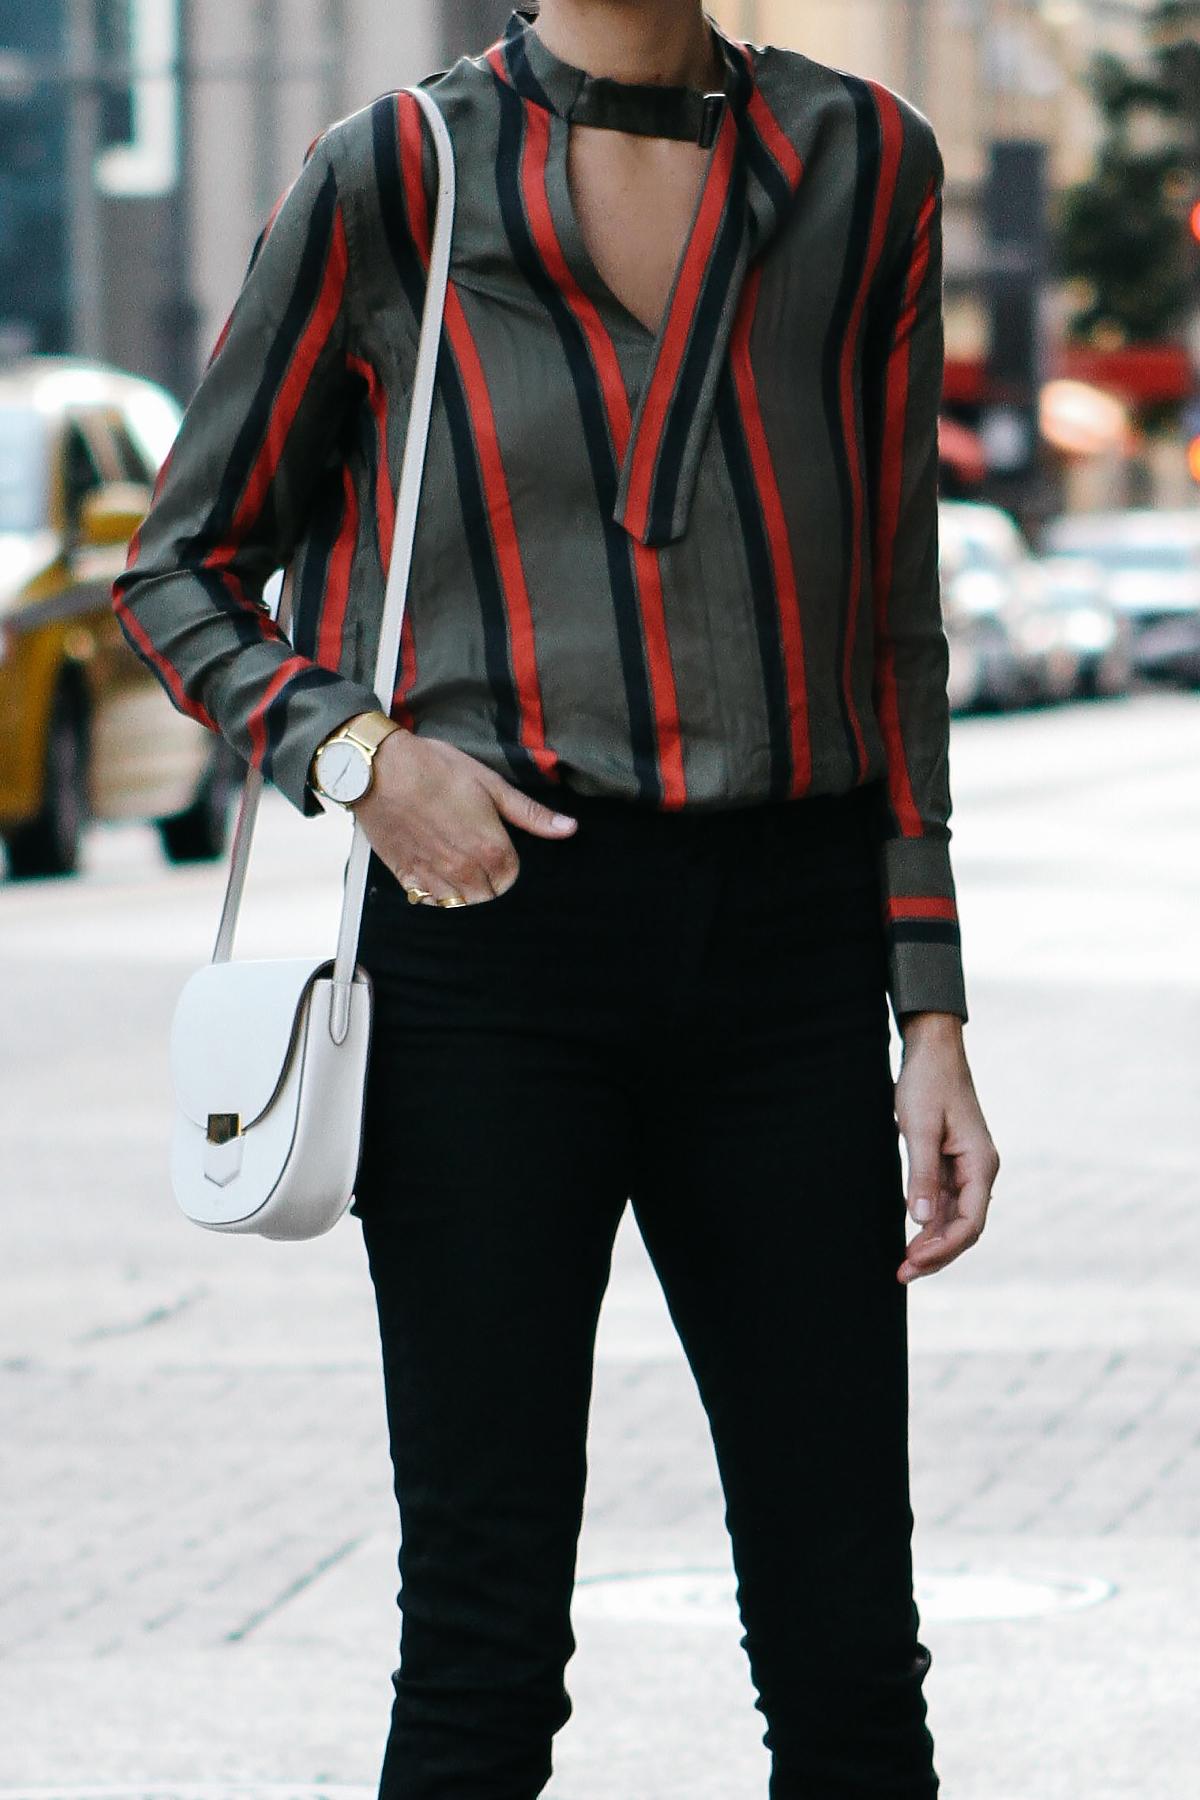 Equipment Janelle Striped Blouse Everlane Black Skinny Jeans Celine Trotteur White Handbag Fashion Jackson Dallas Blogger Fashion Blogger Street Style